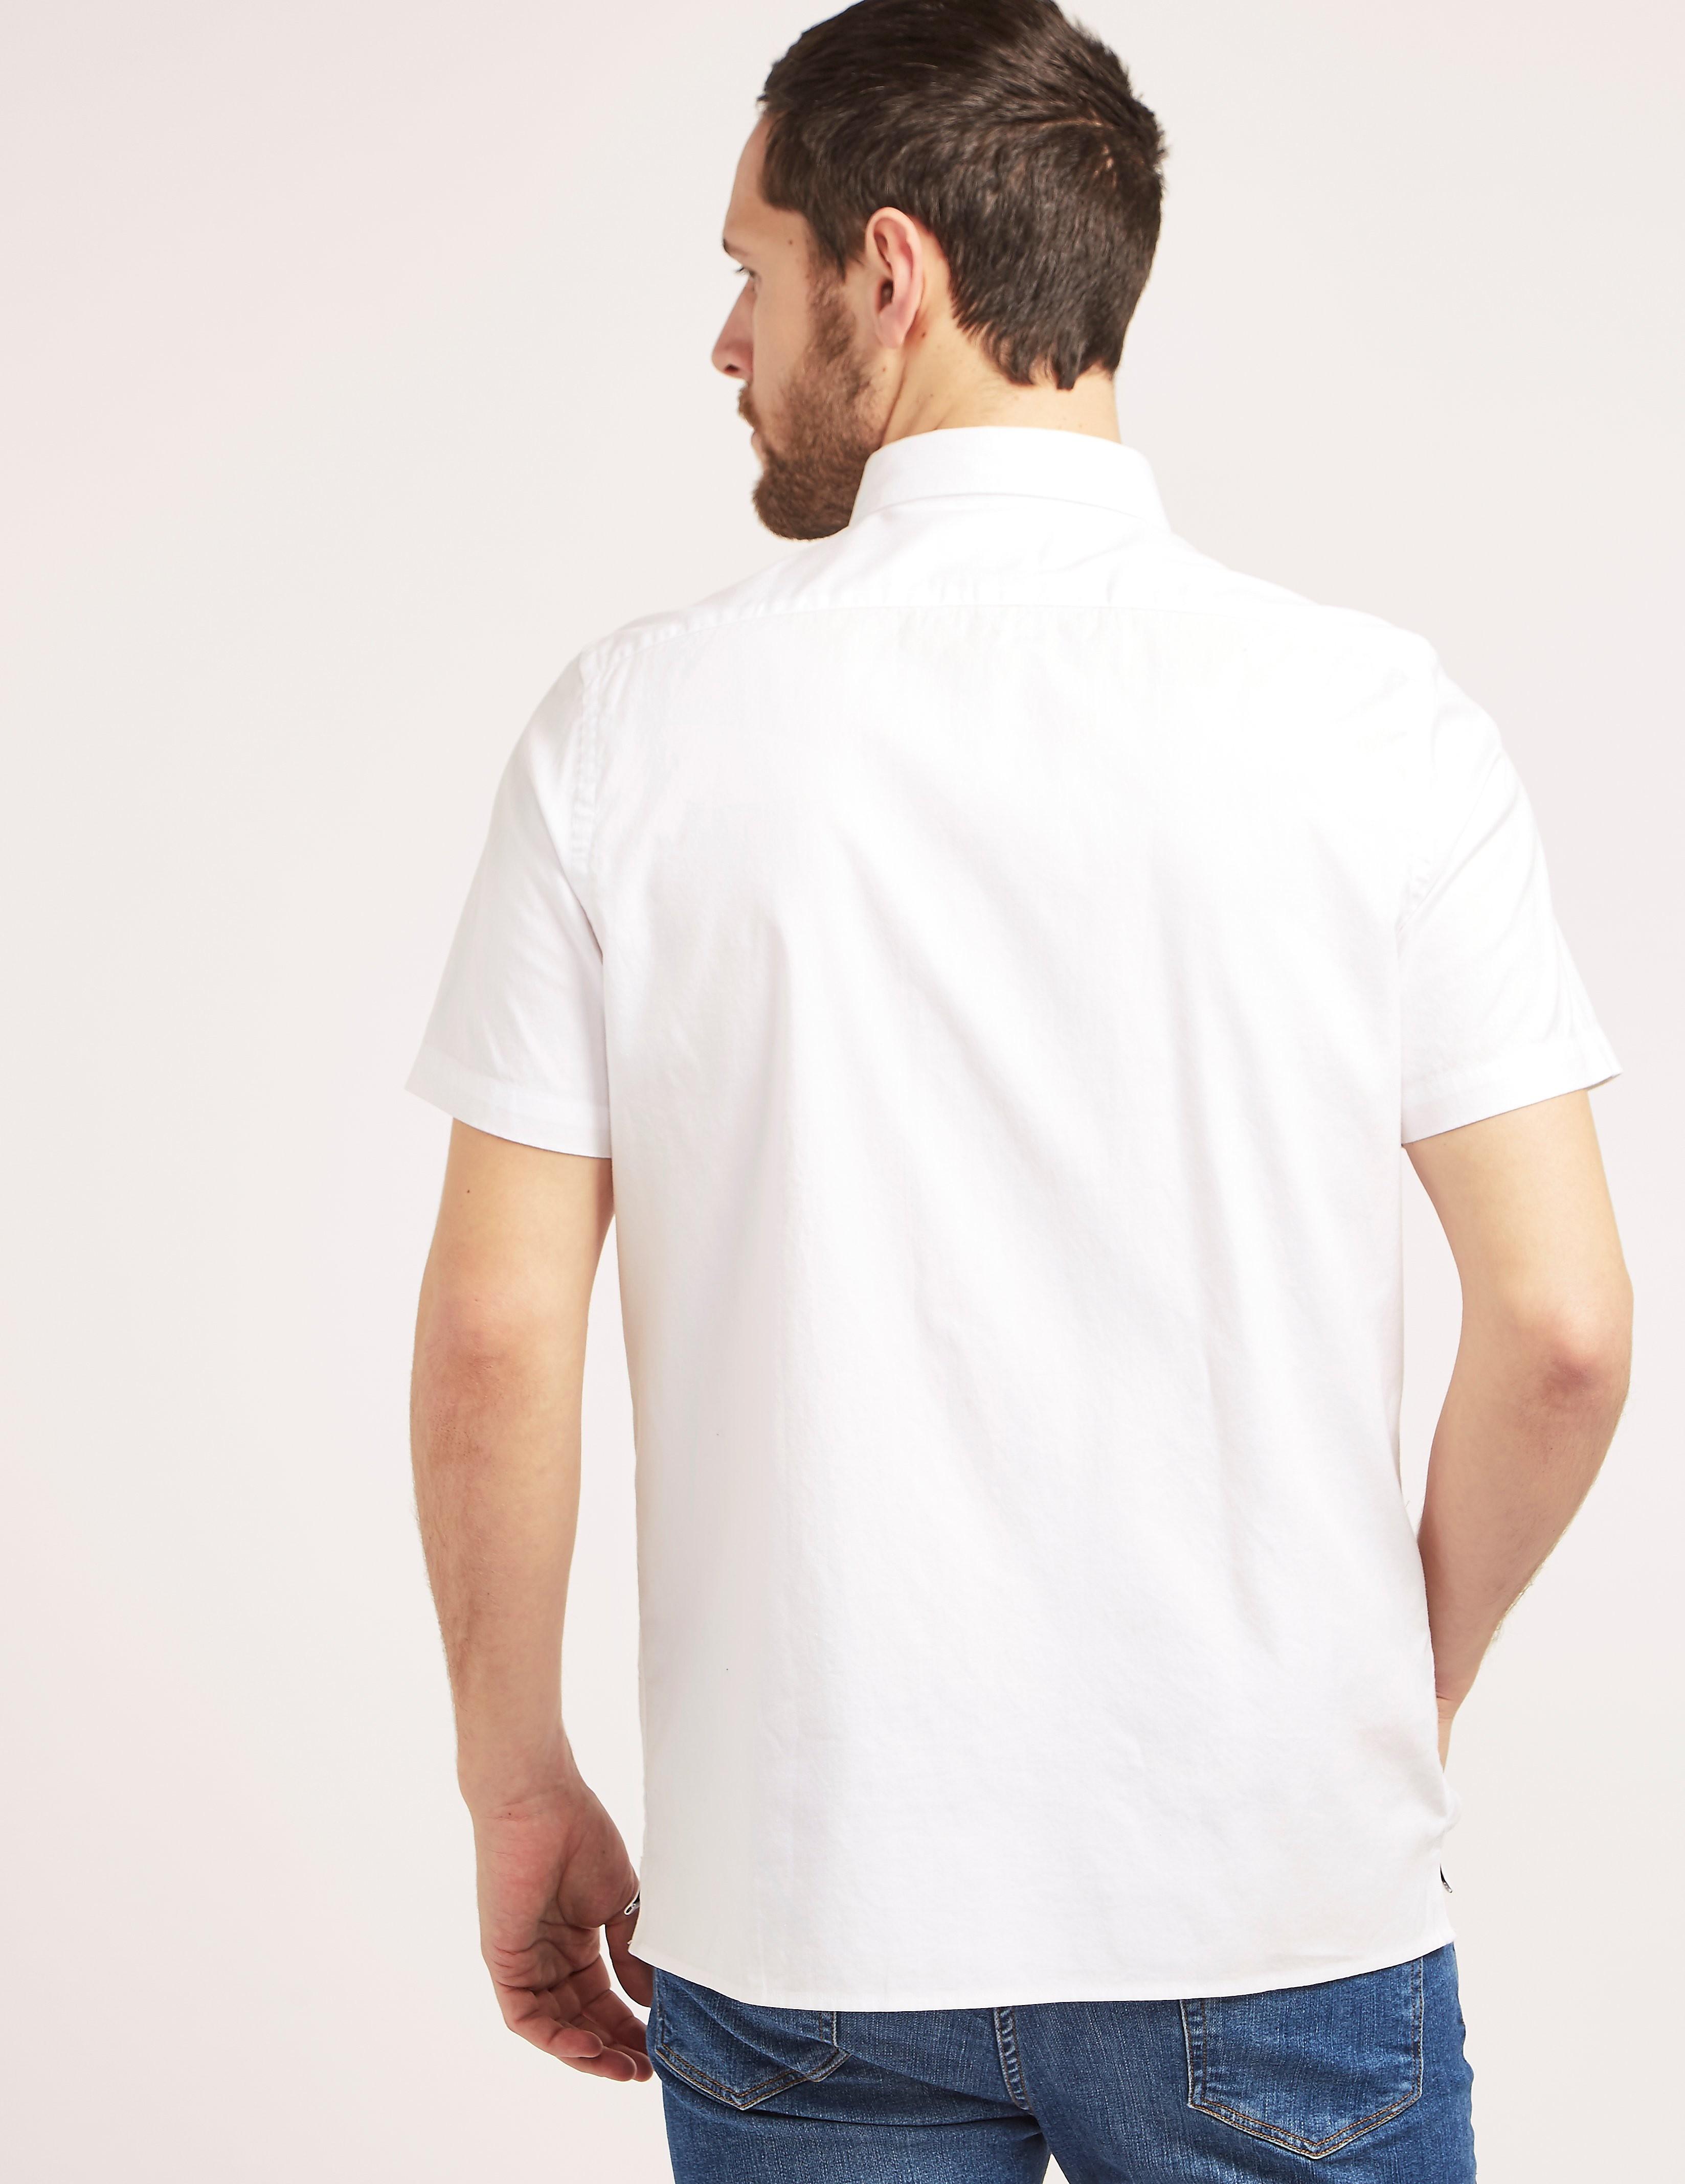 Paul Smith Regular Short Sleeve Shirt